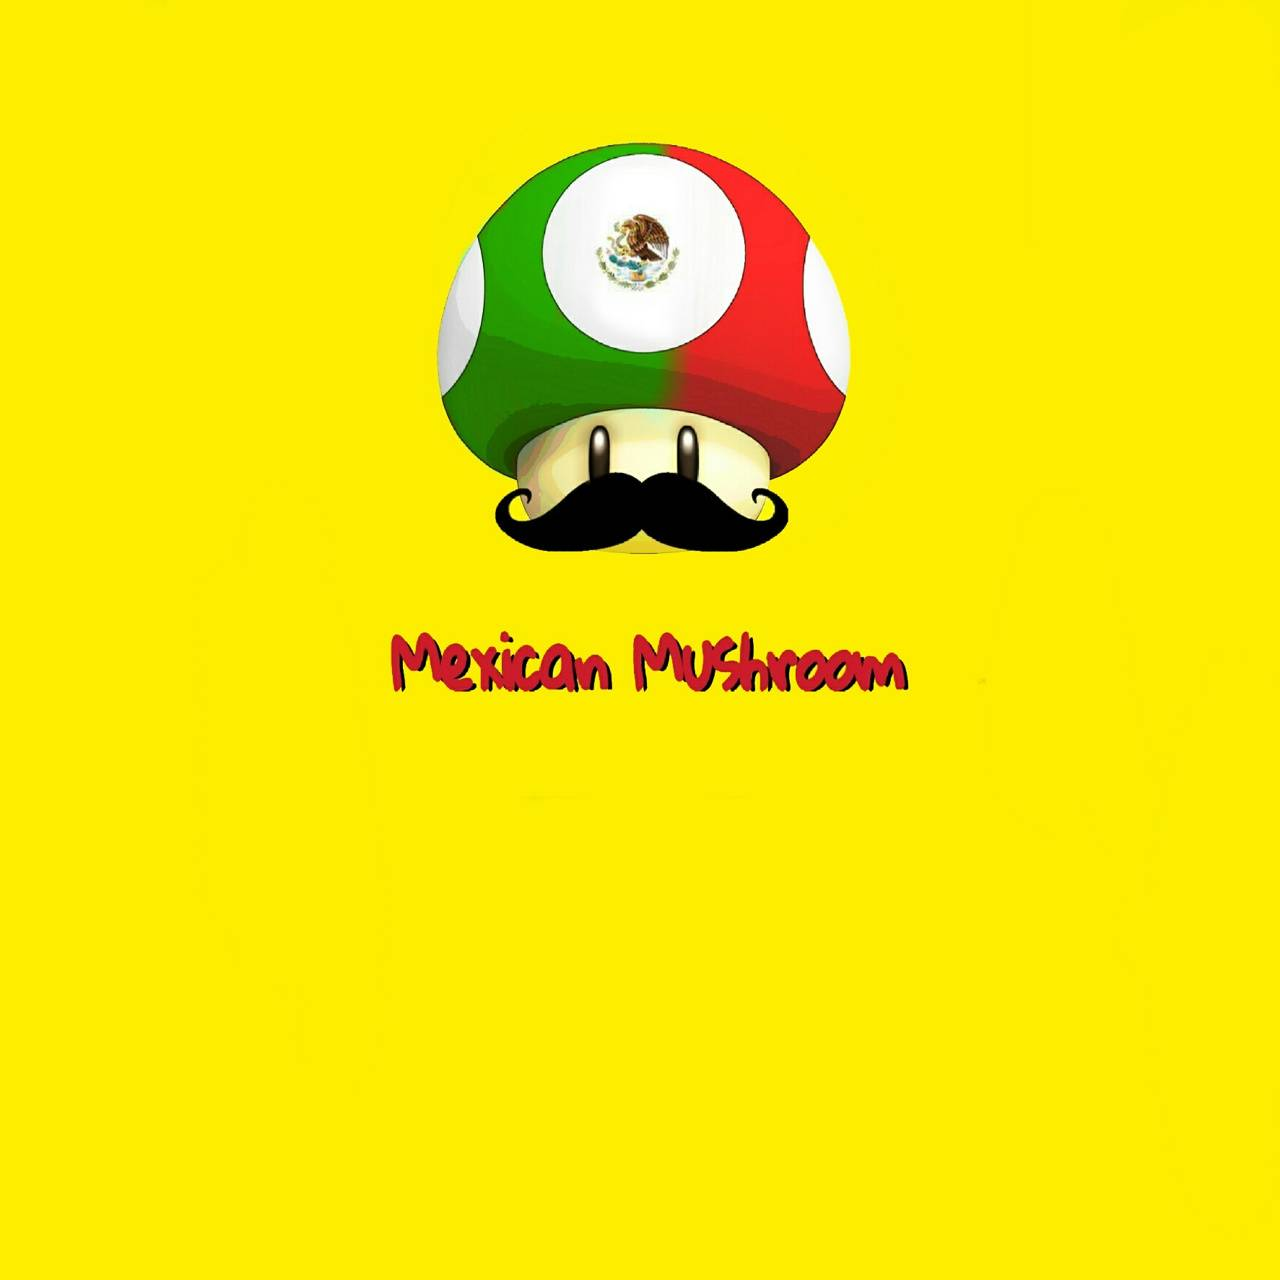 Mexican mushroom